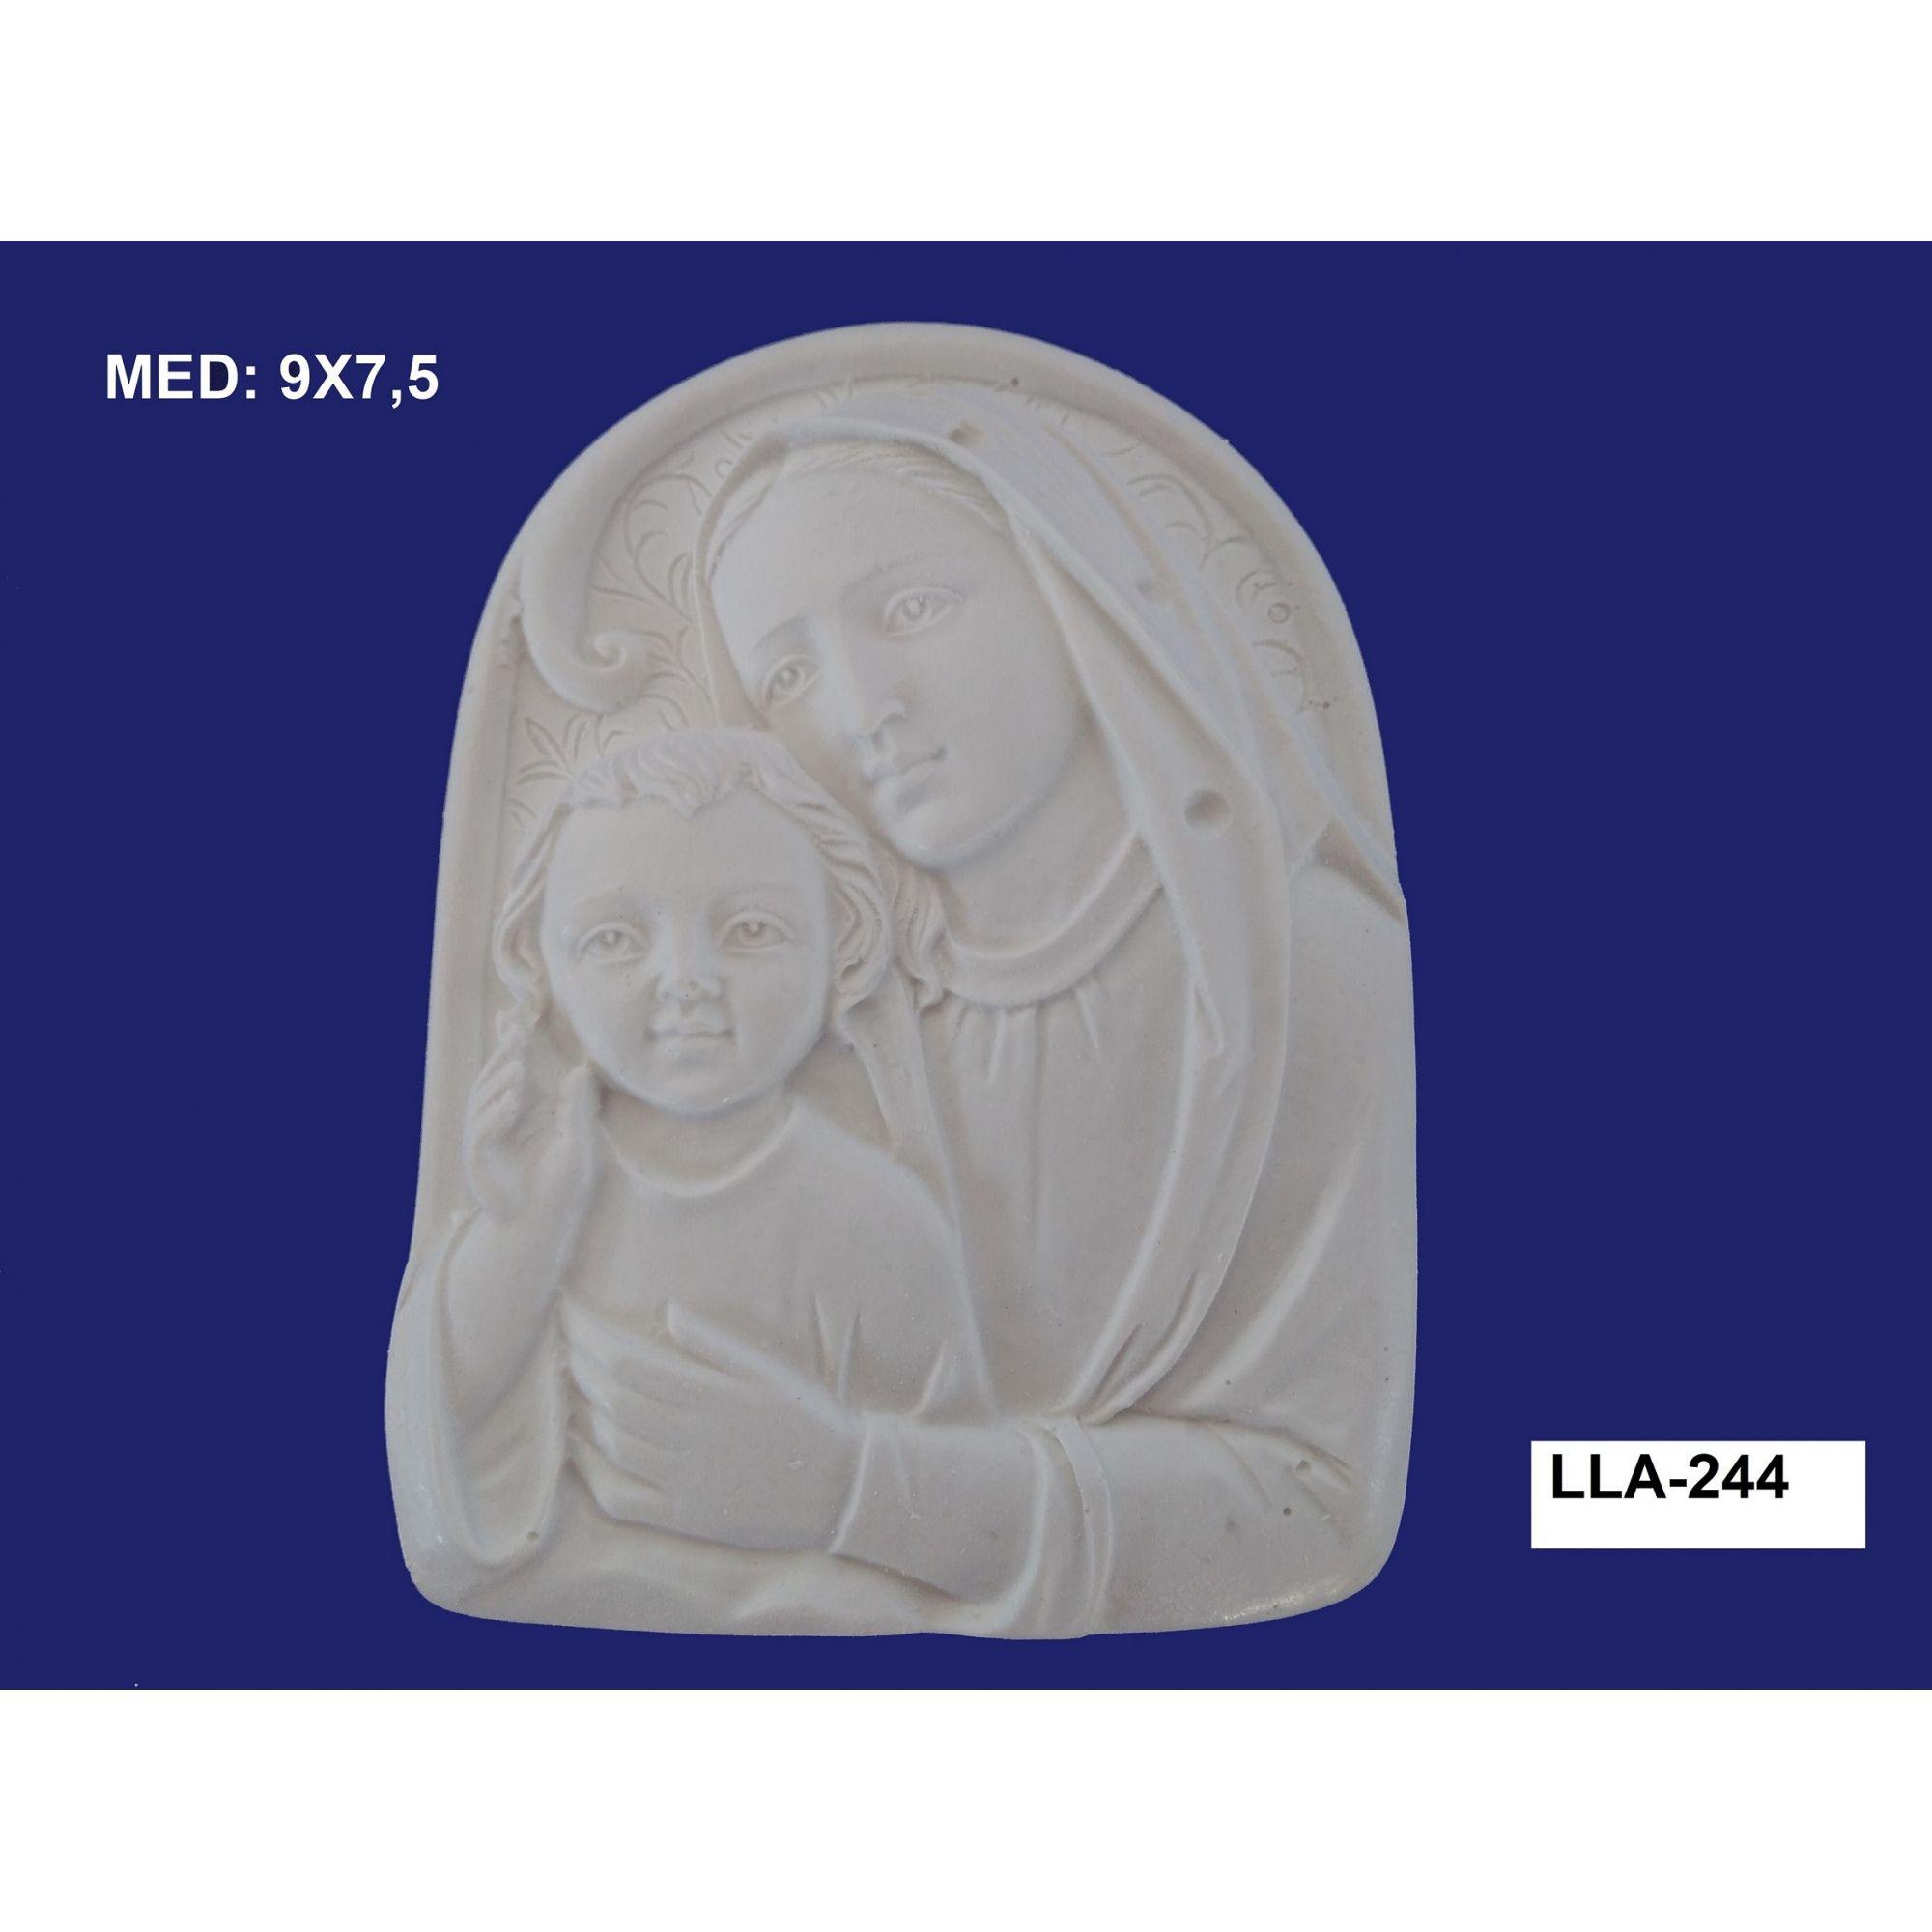 LLA-244 APLIQUE MARIA E JESUS 09X7,5CM